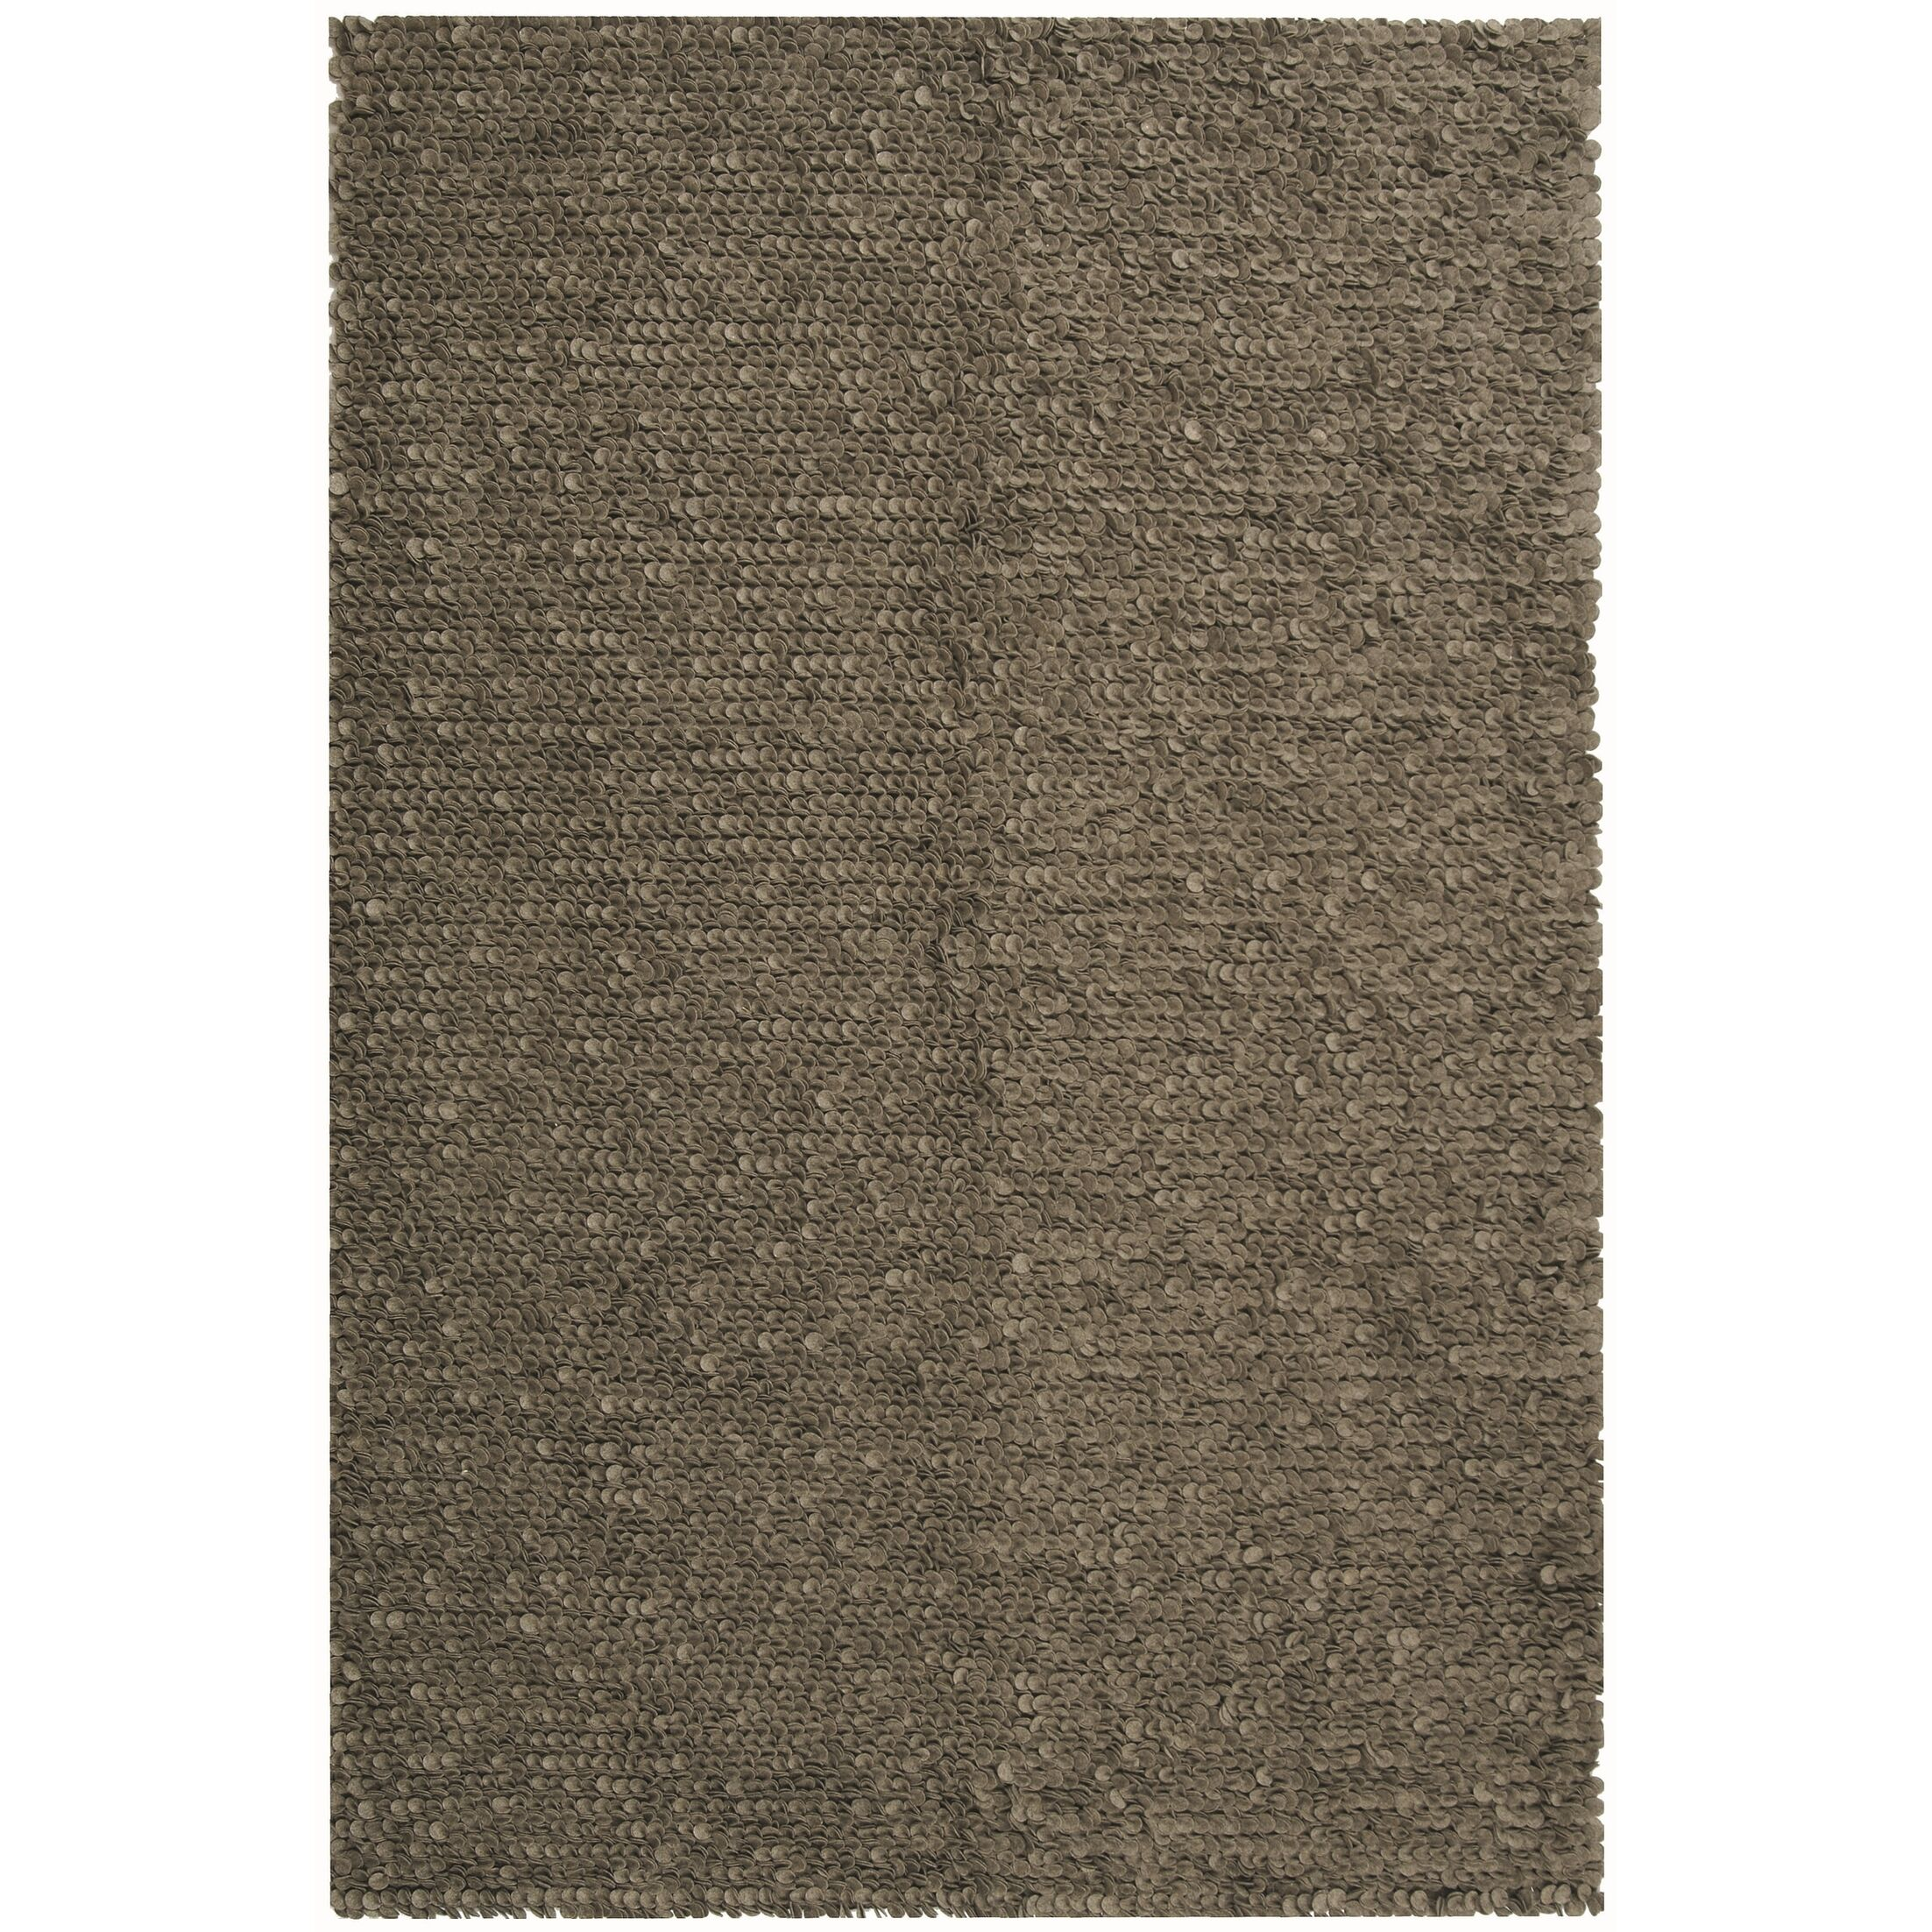 Sinope Grey Area Rug Rug Size: Rectangle 4' x 6'